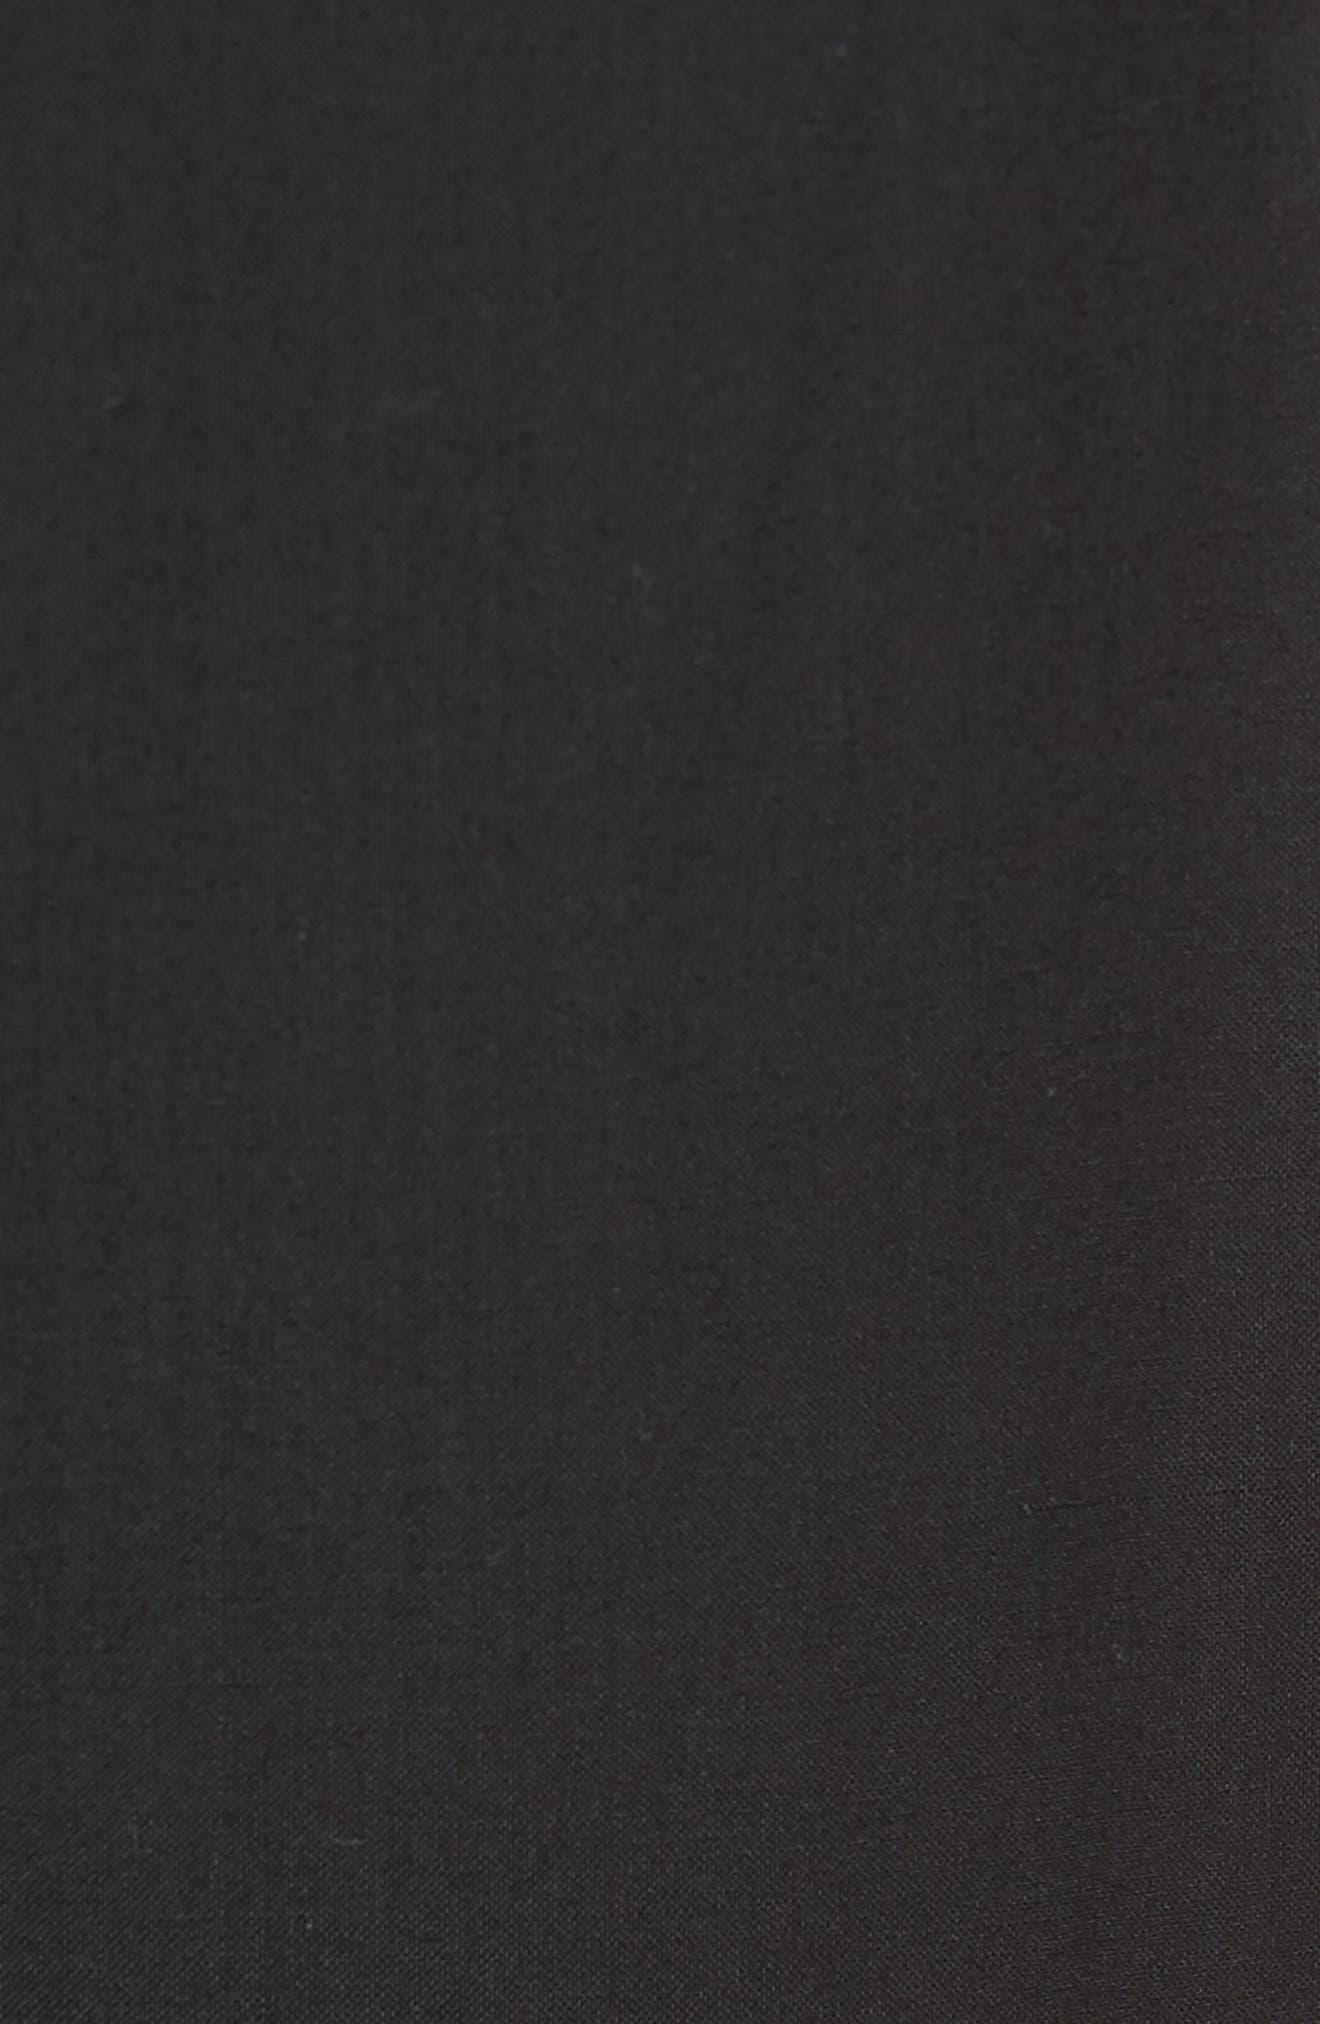 Regular Fit Track Pants,                             Alternate thumbnail 5, color,                             Black